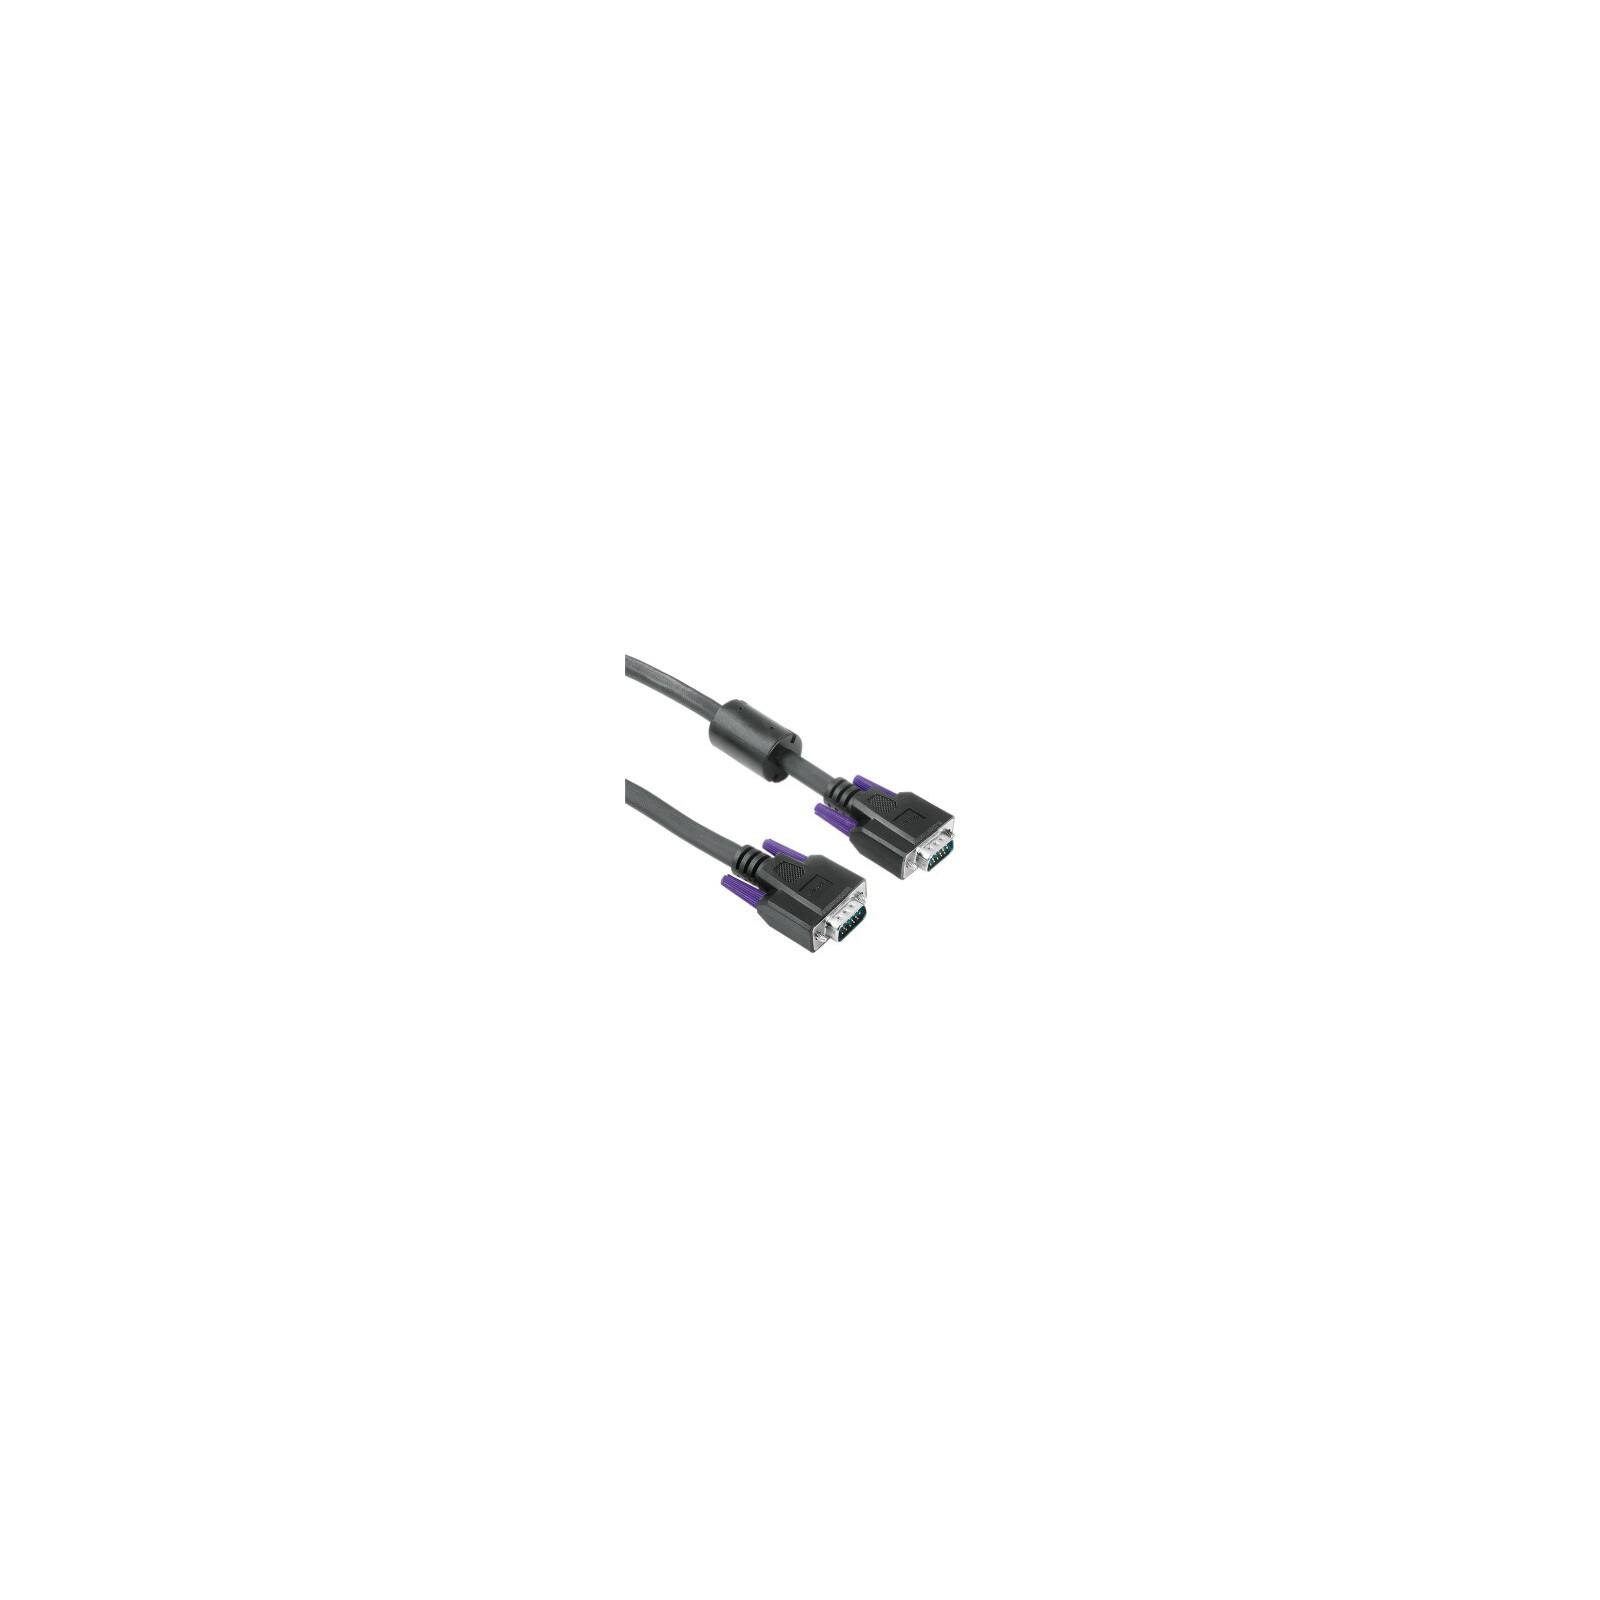 Hama 122228 Video-Verbindungskabel 1,8m